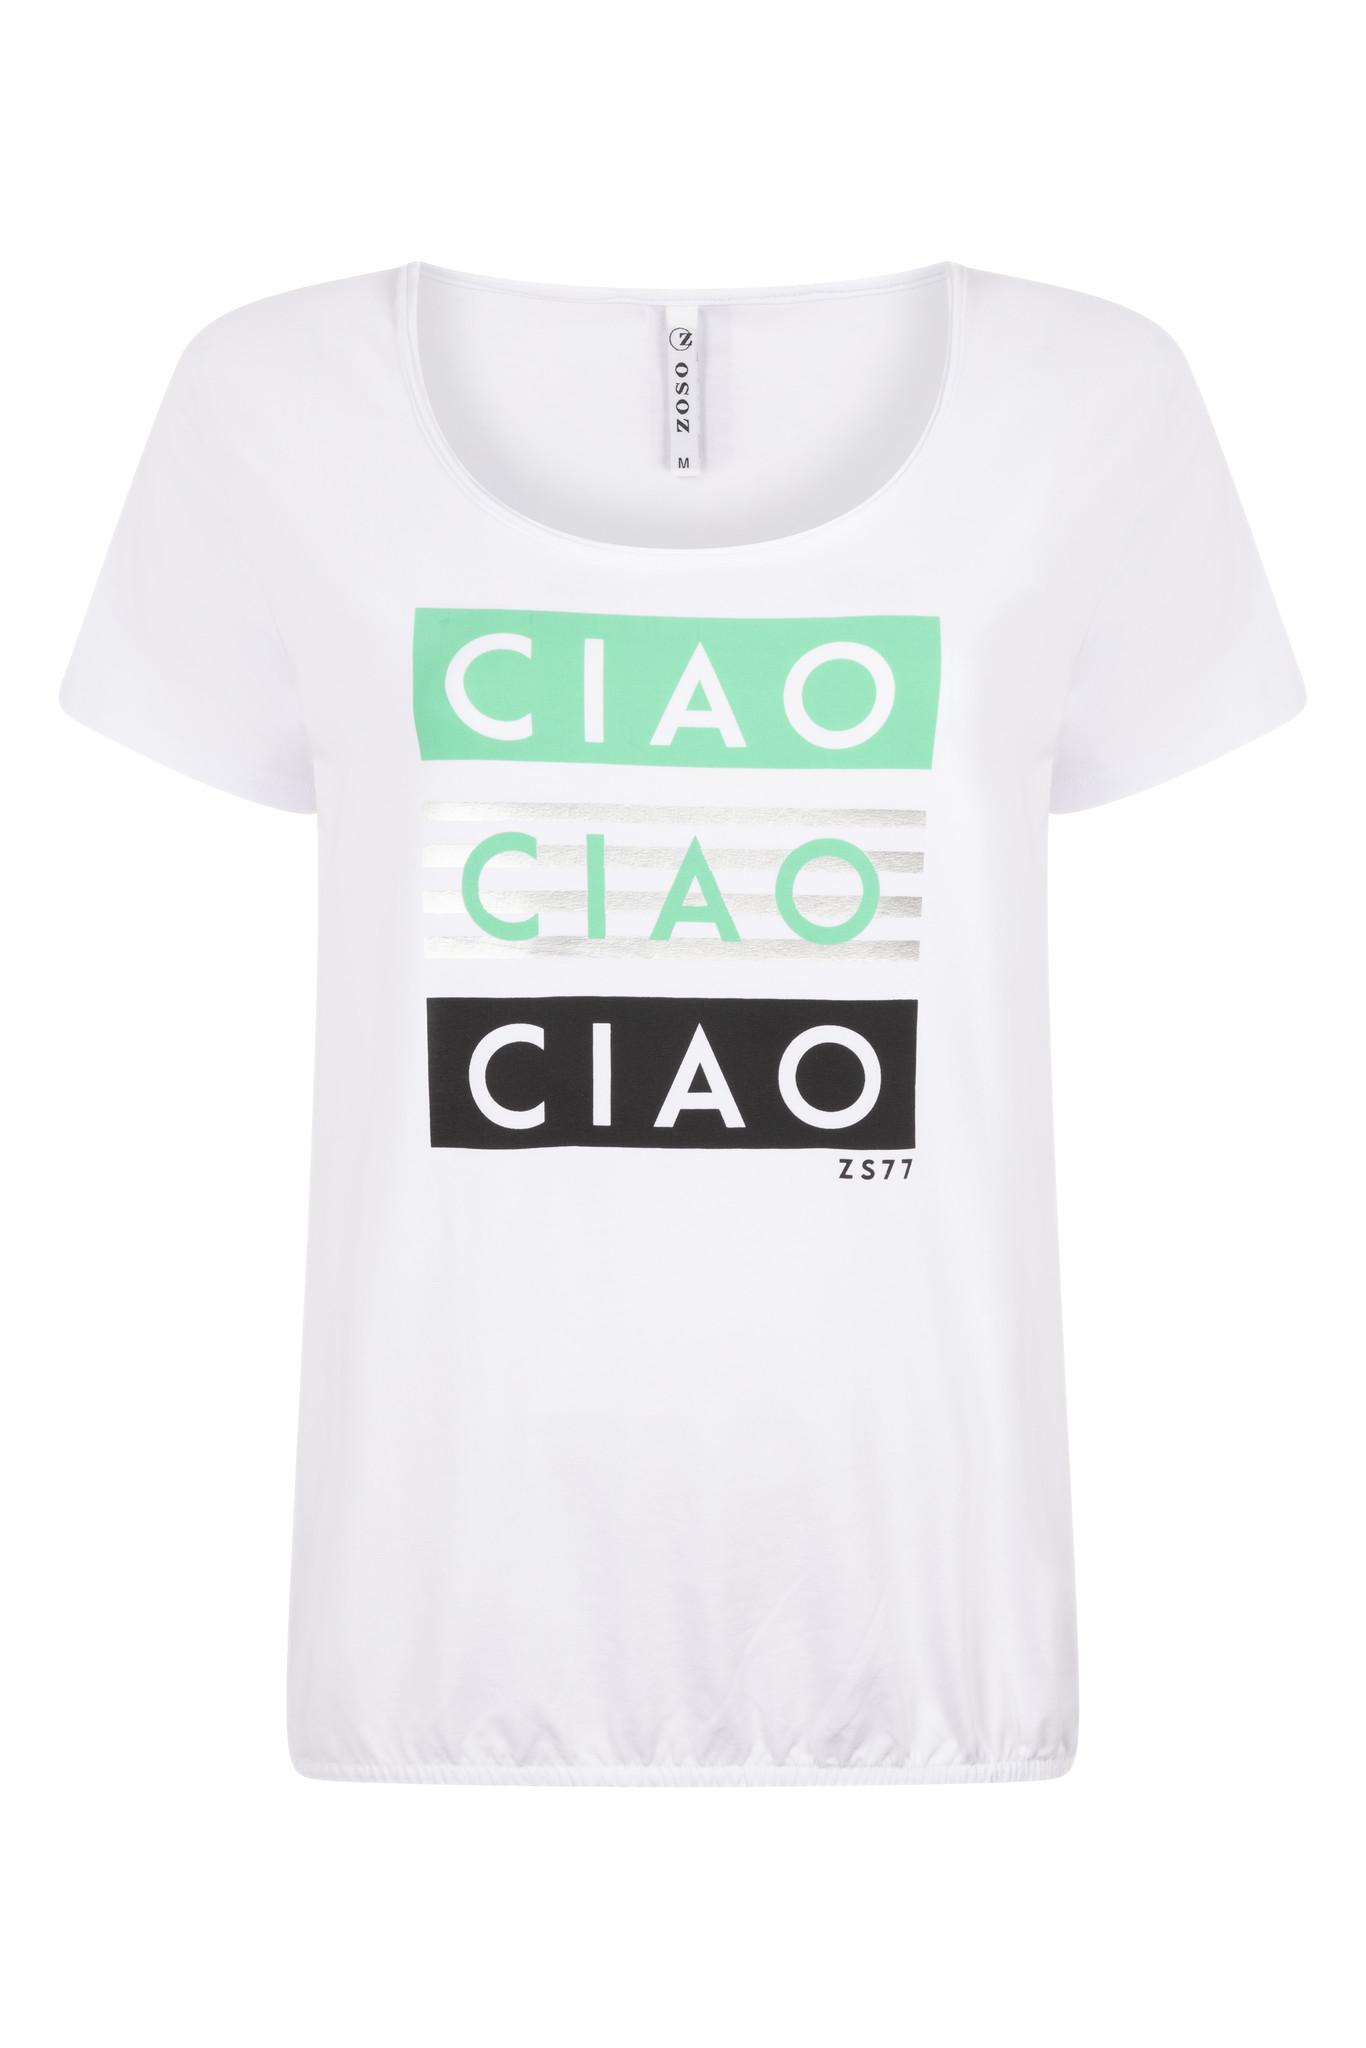 Zoso Zoso Ciao t-shirt with print white/green